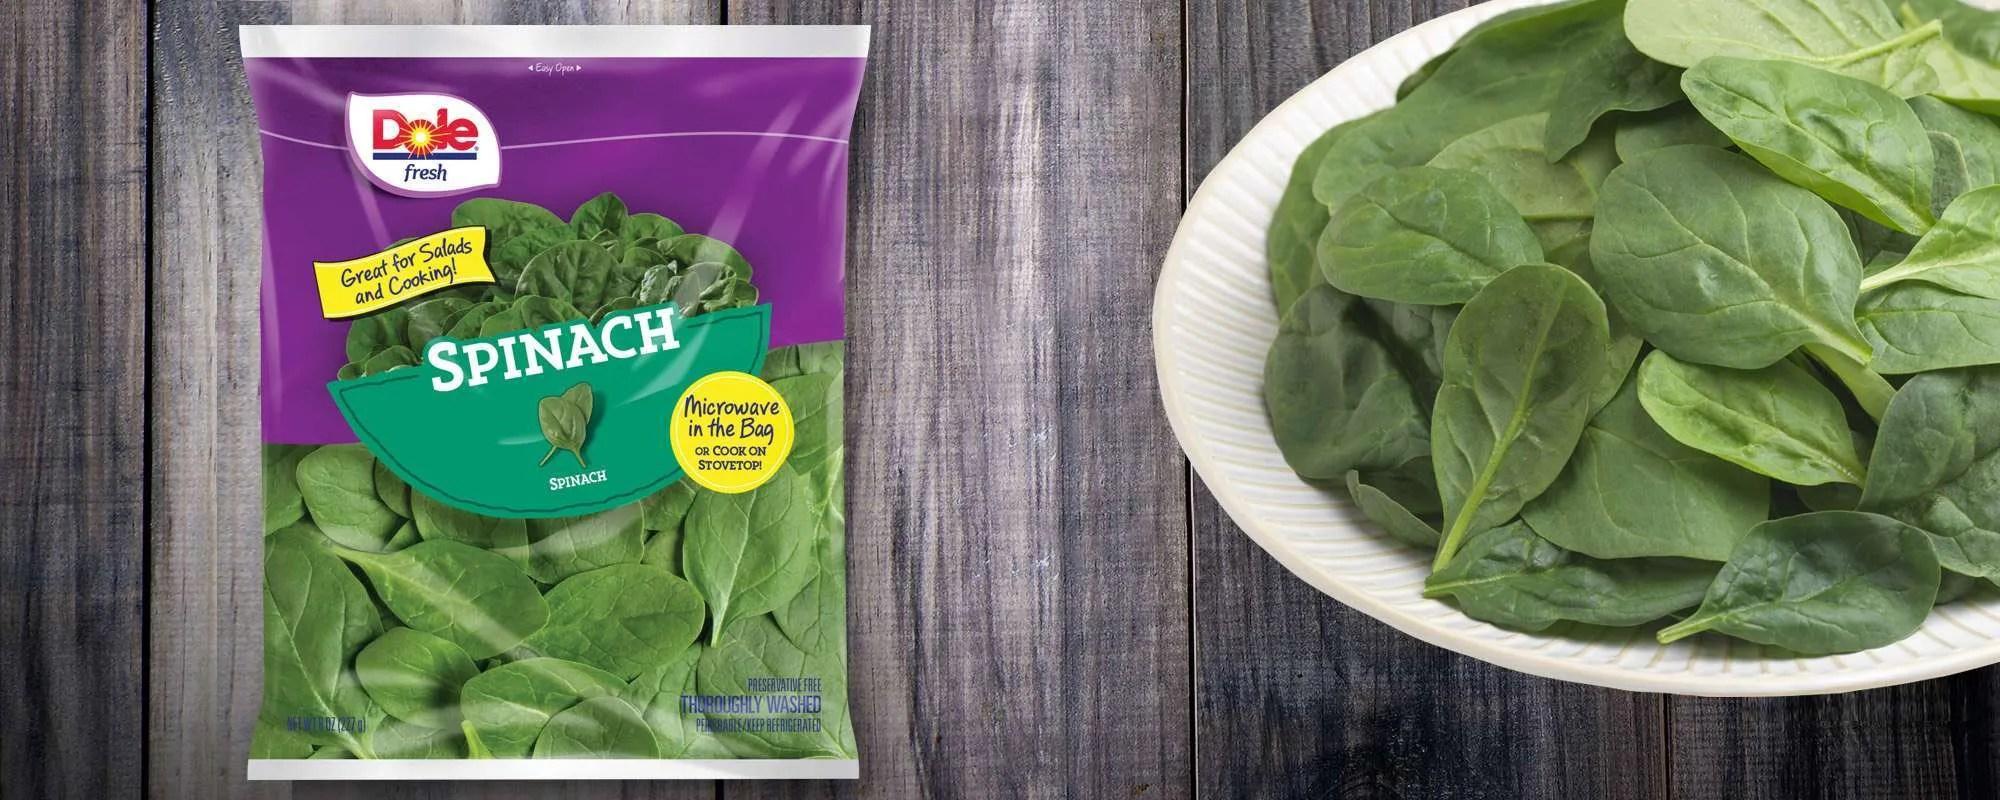 Dole Recalls Spinach Over Salmonella Concerns